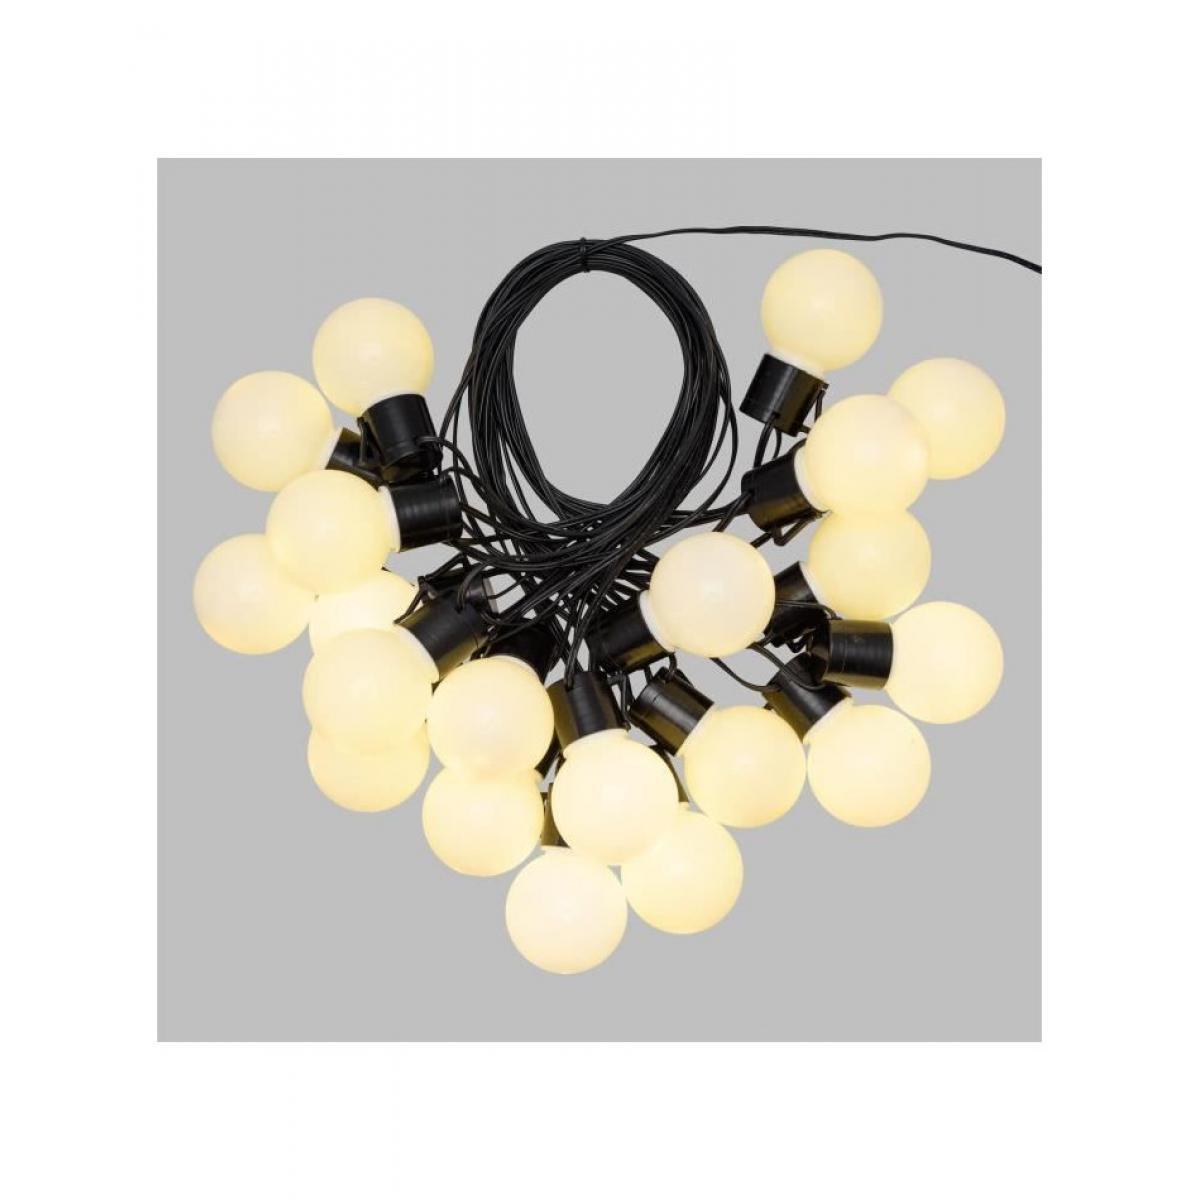 Lotti LOTTI Guirlande lumineuse d'été LED - 10 m - Ø50 x H60 mm - Blanc chaud